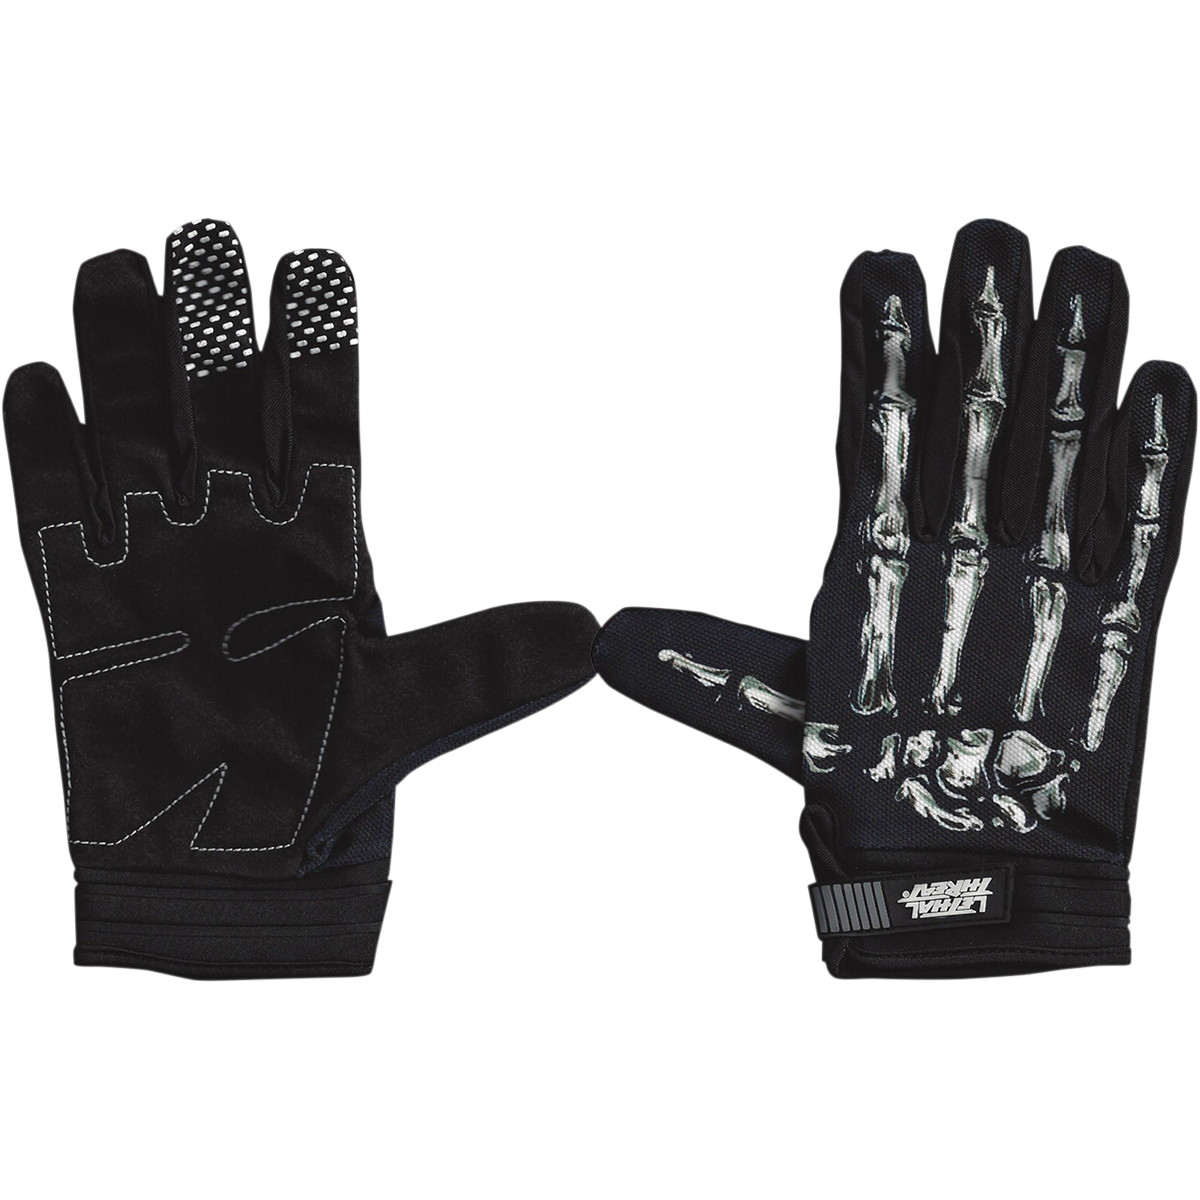 lethal threat gloves mens short cuff textile bone hand